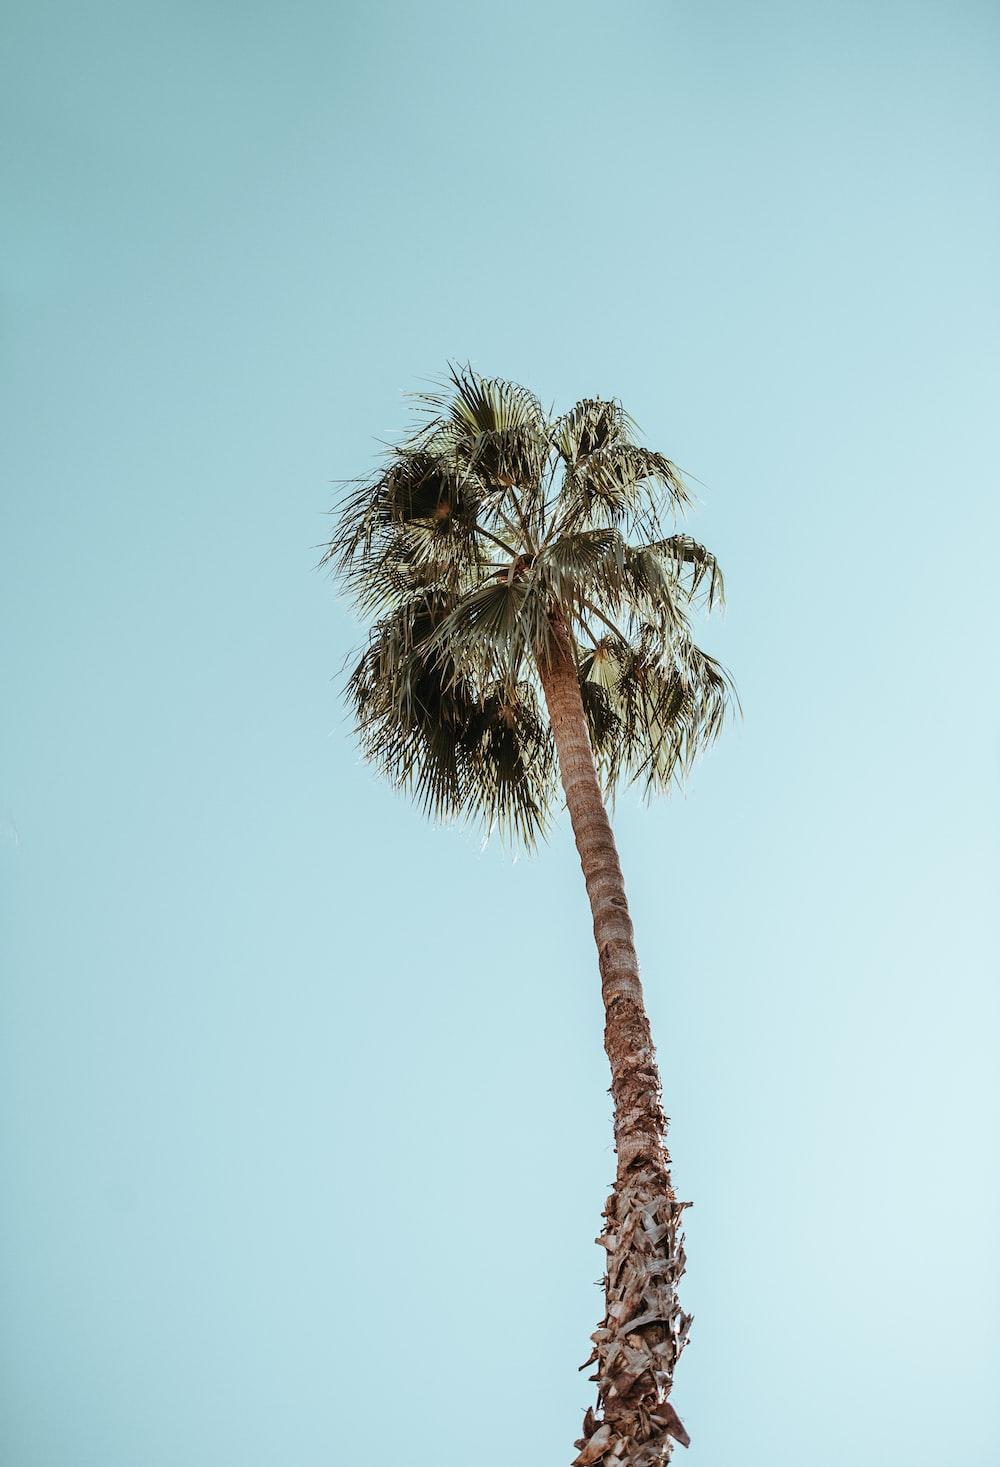 photograph of palm tree